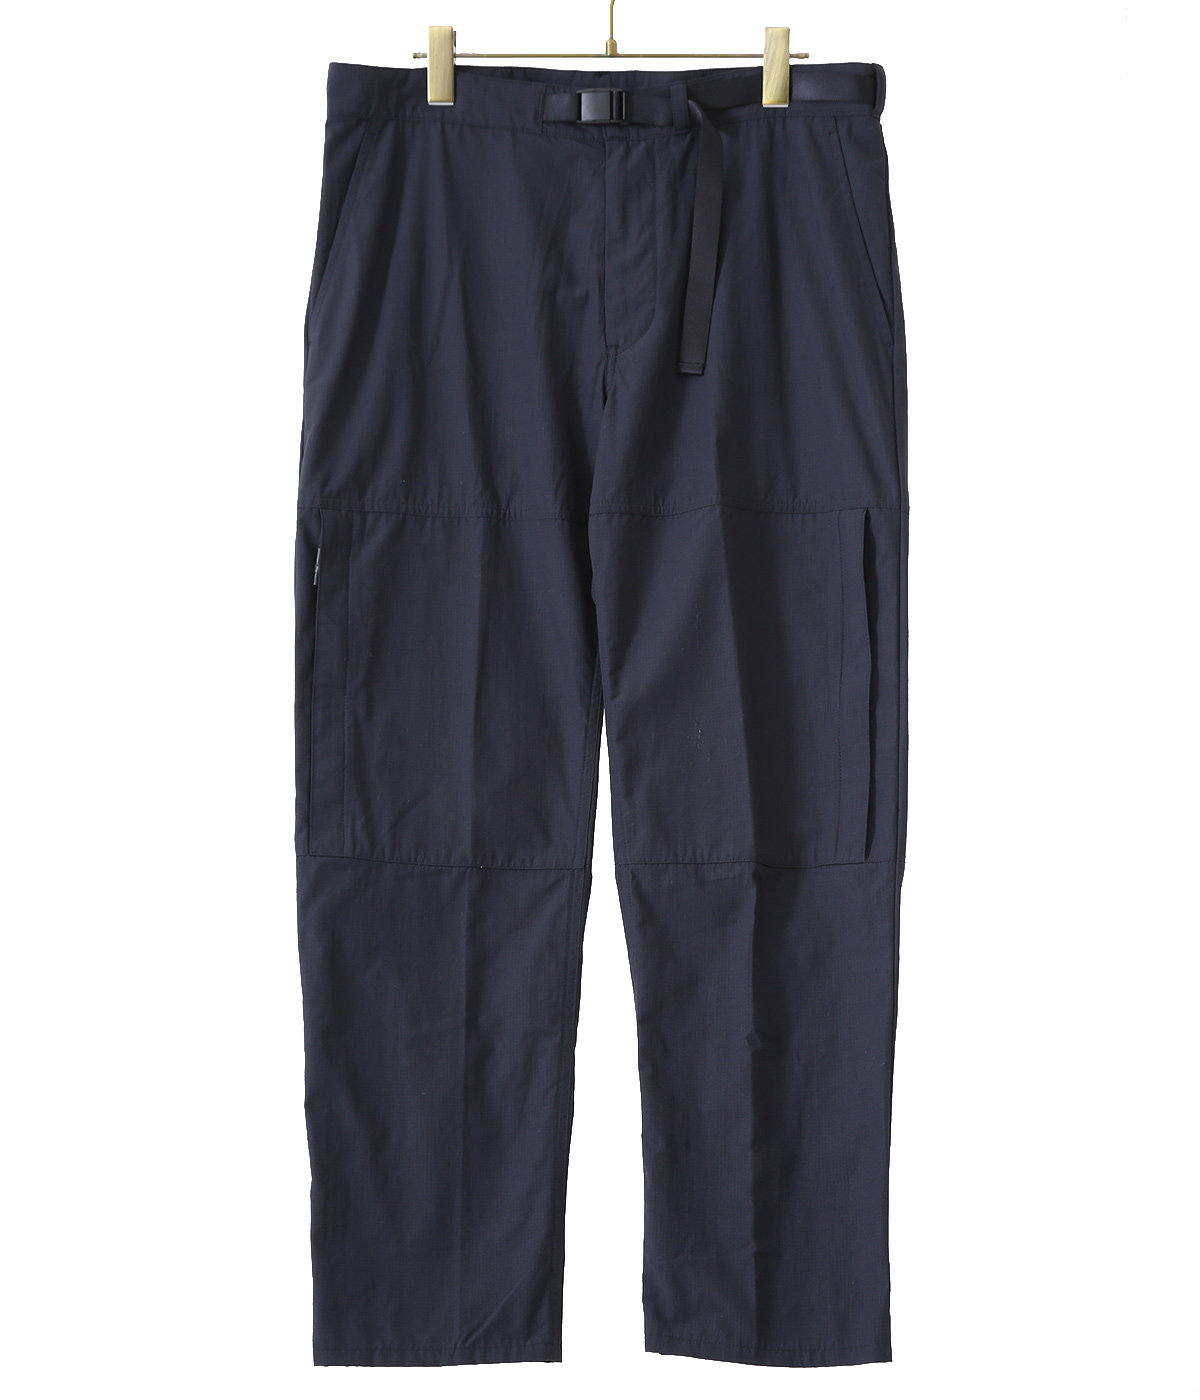 ddd / PARACHUTE PANTS